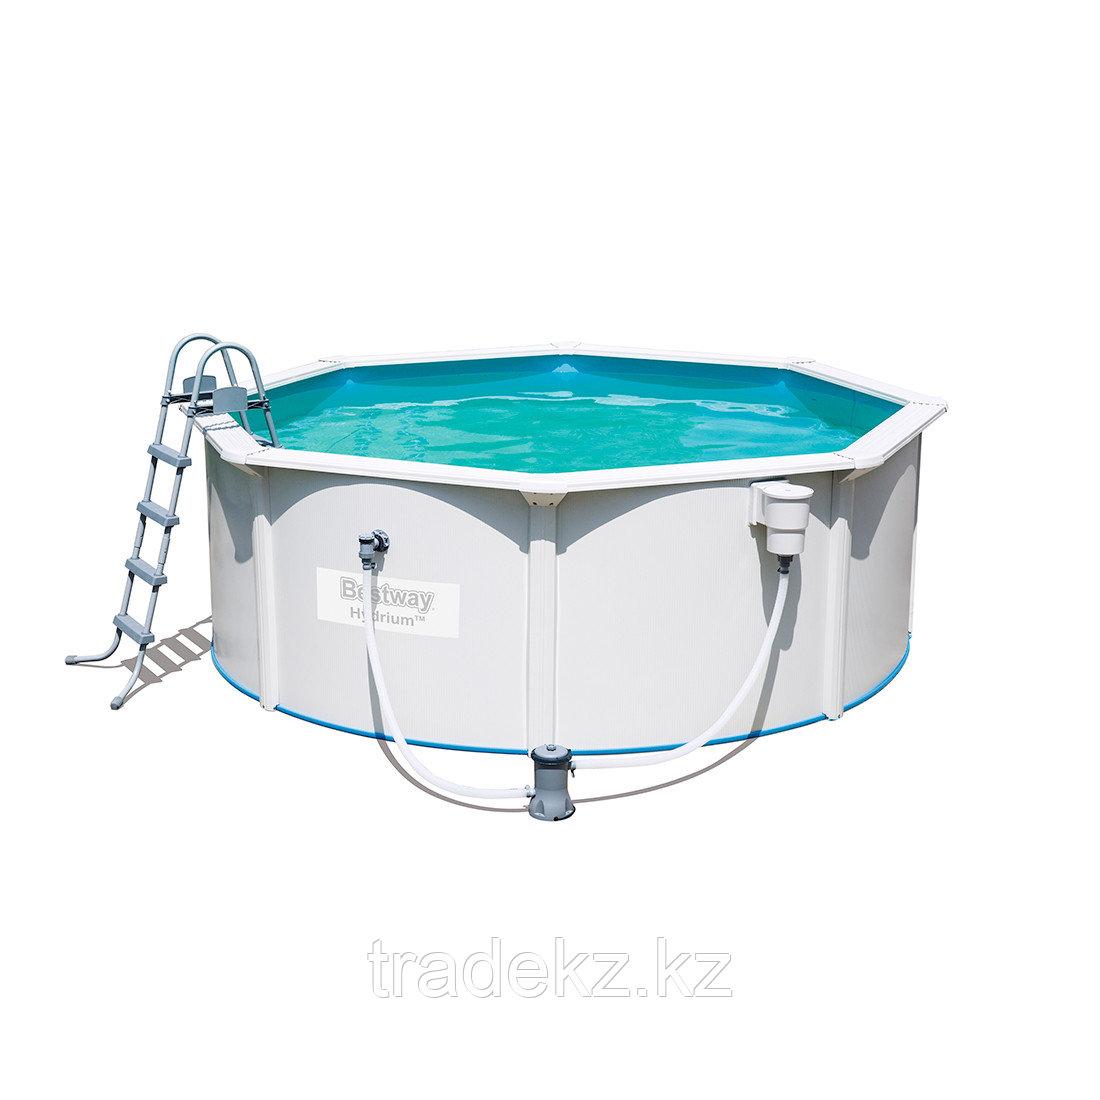 Каркасный бассейн Bestway 56571